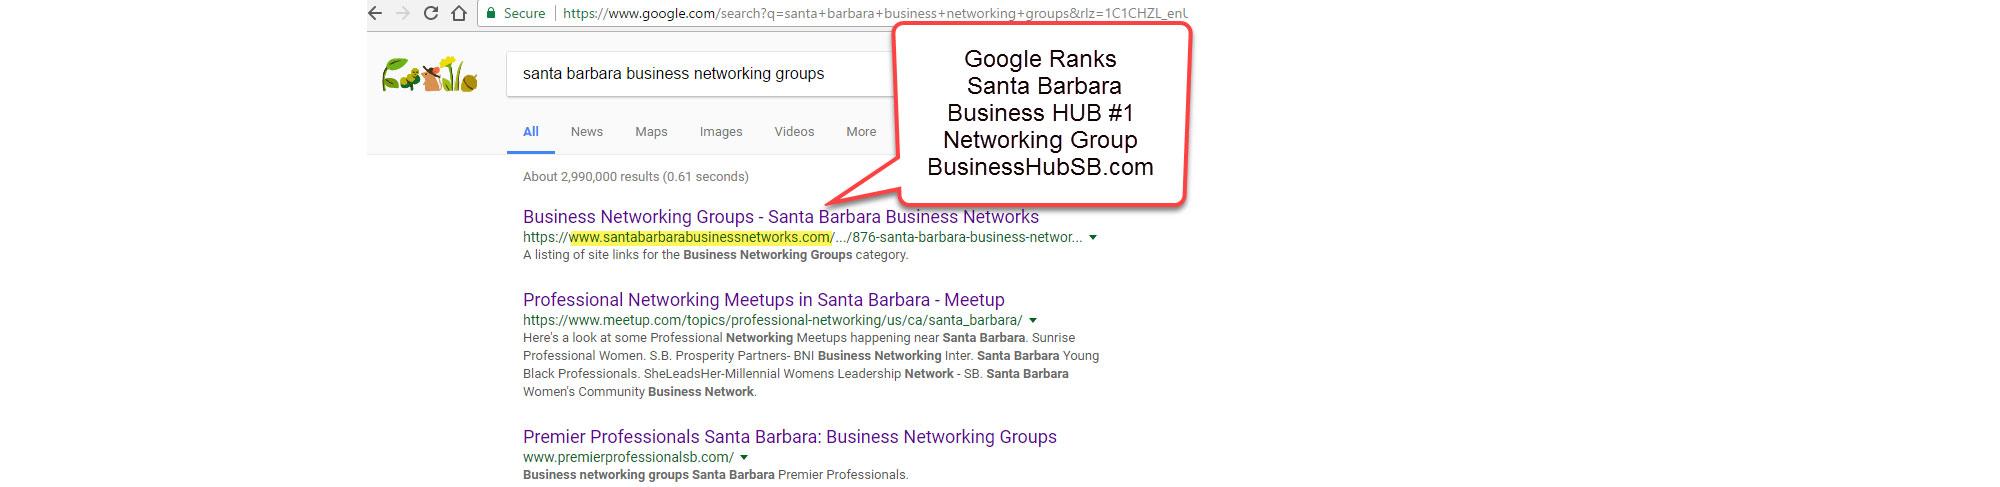 Santa Barbara Business Networking HUB